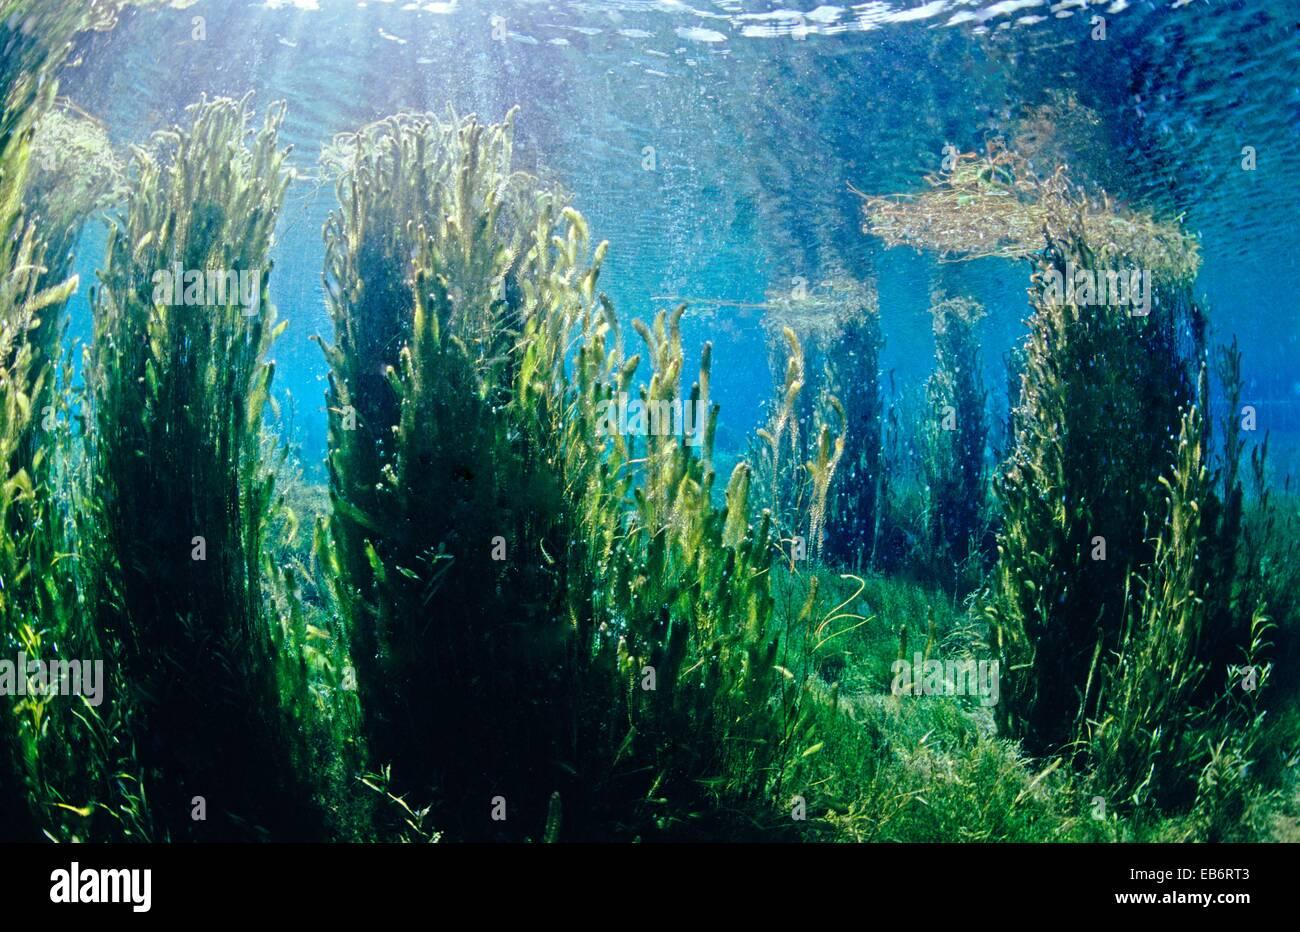 Image source plantsam com - Freshwater Plants And Underwater Landscape Of A Limestone Lagoon Source Of River Minho Fonmi A Galicia Spain